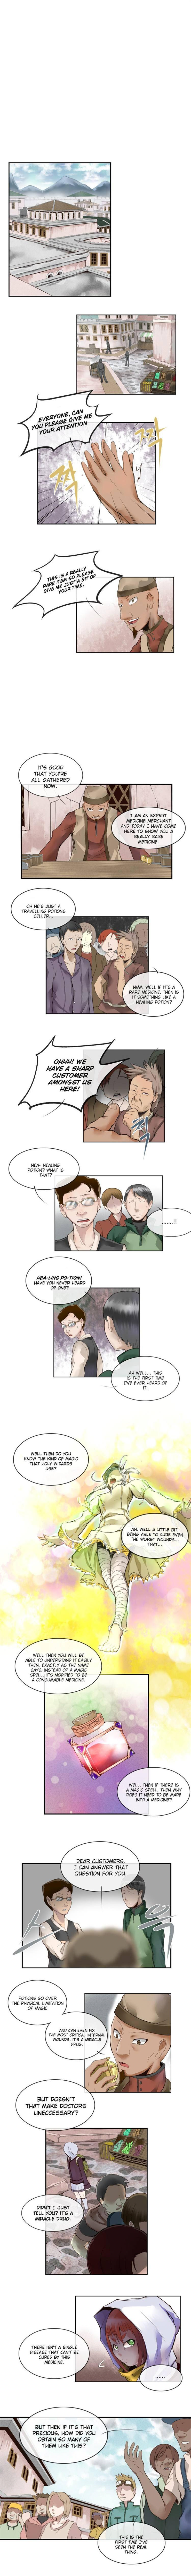 Potion Mania 1 Page 1